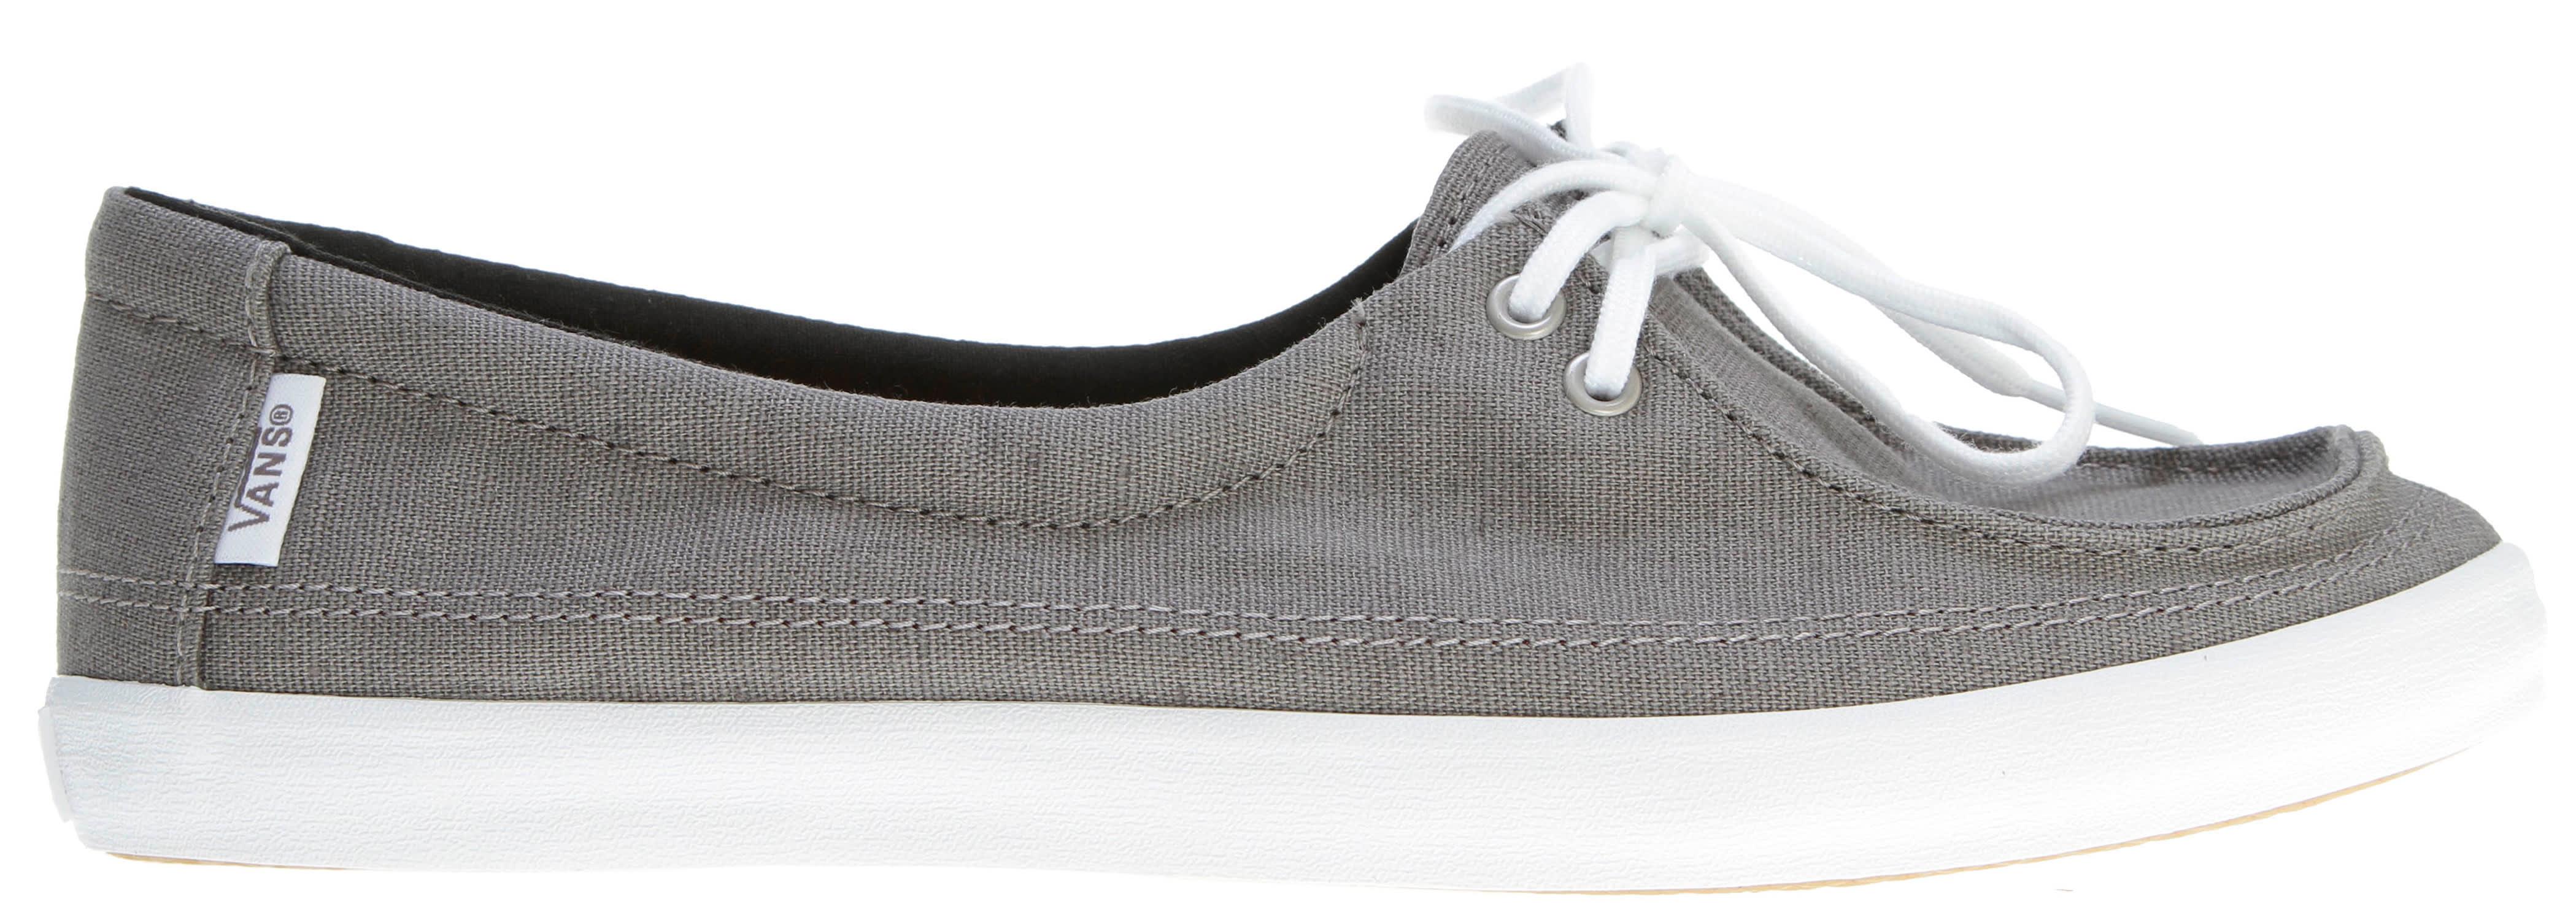 fab82f680ae014 Vans Rata Lo Shoes - thumbnail 1